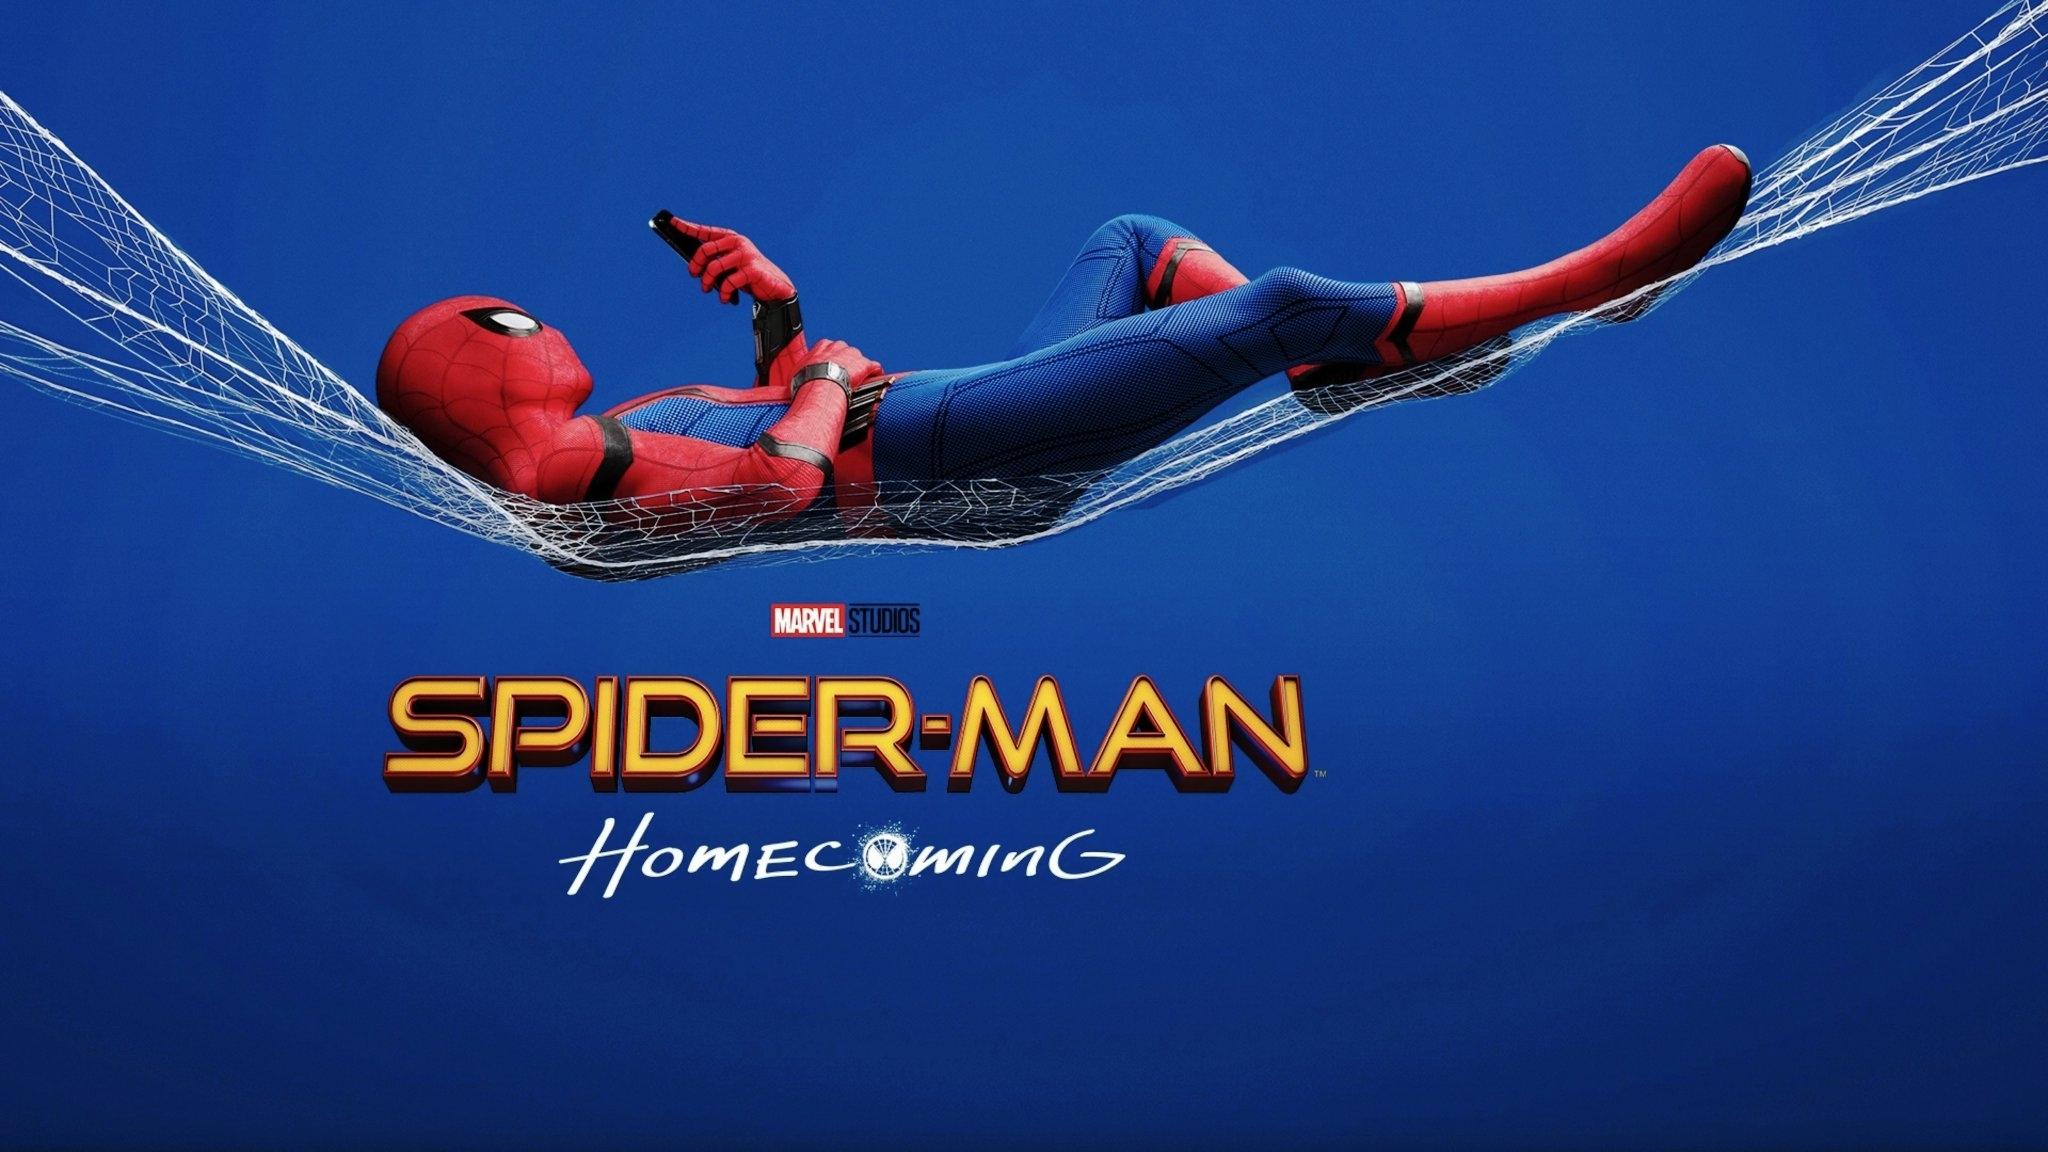 spider-man: homecoming full hd fond d'écran and arrière-plan